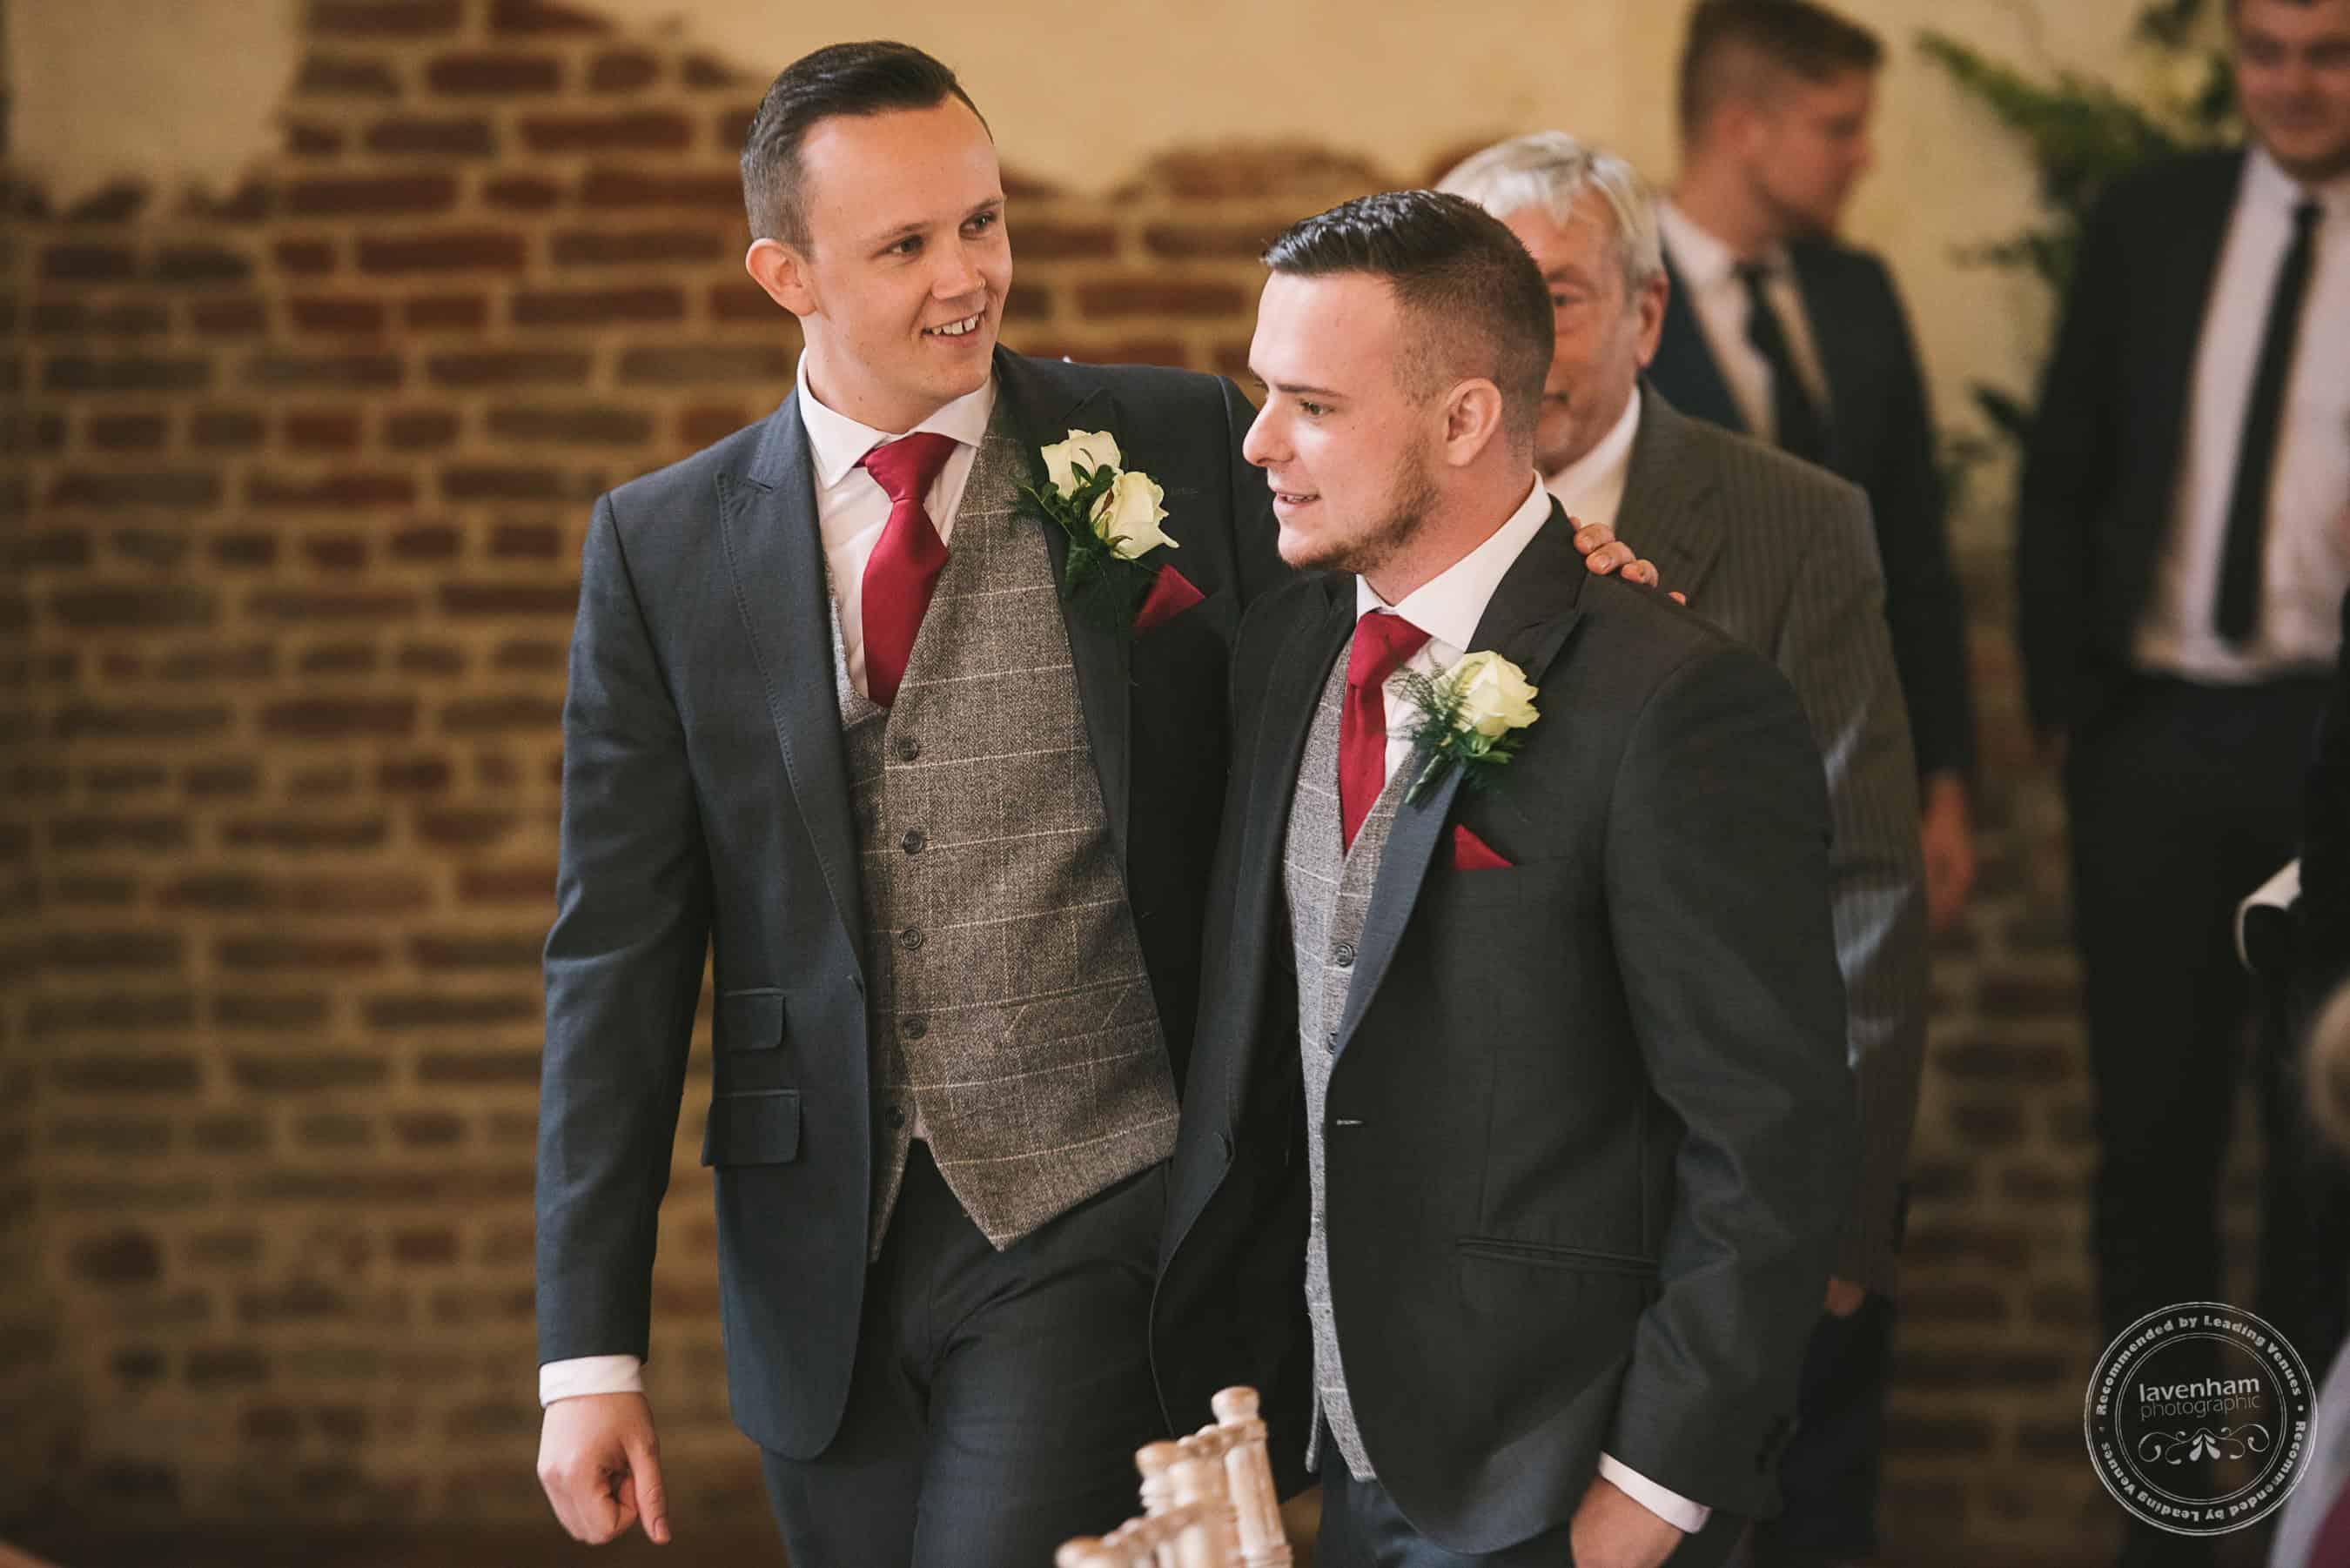 251118 Leez Priory Wedding Photography by Lavenham Photographic 024